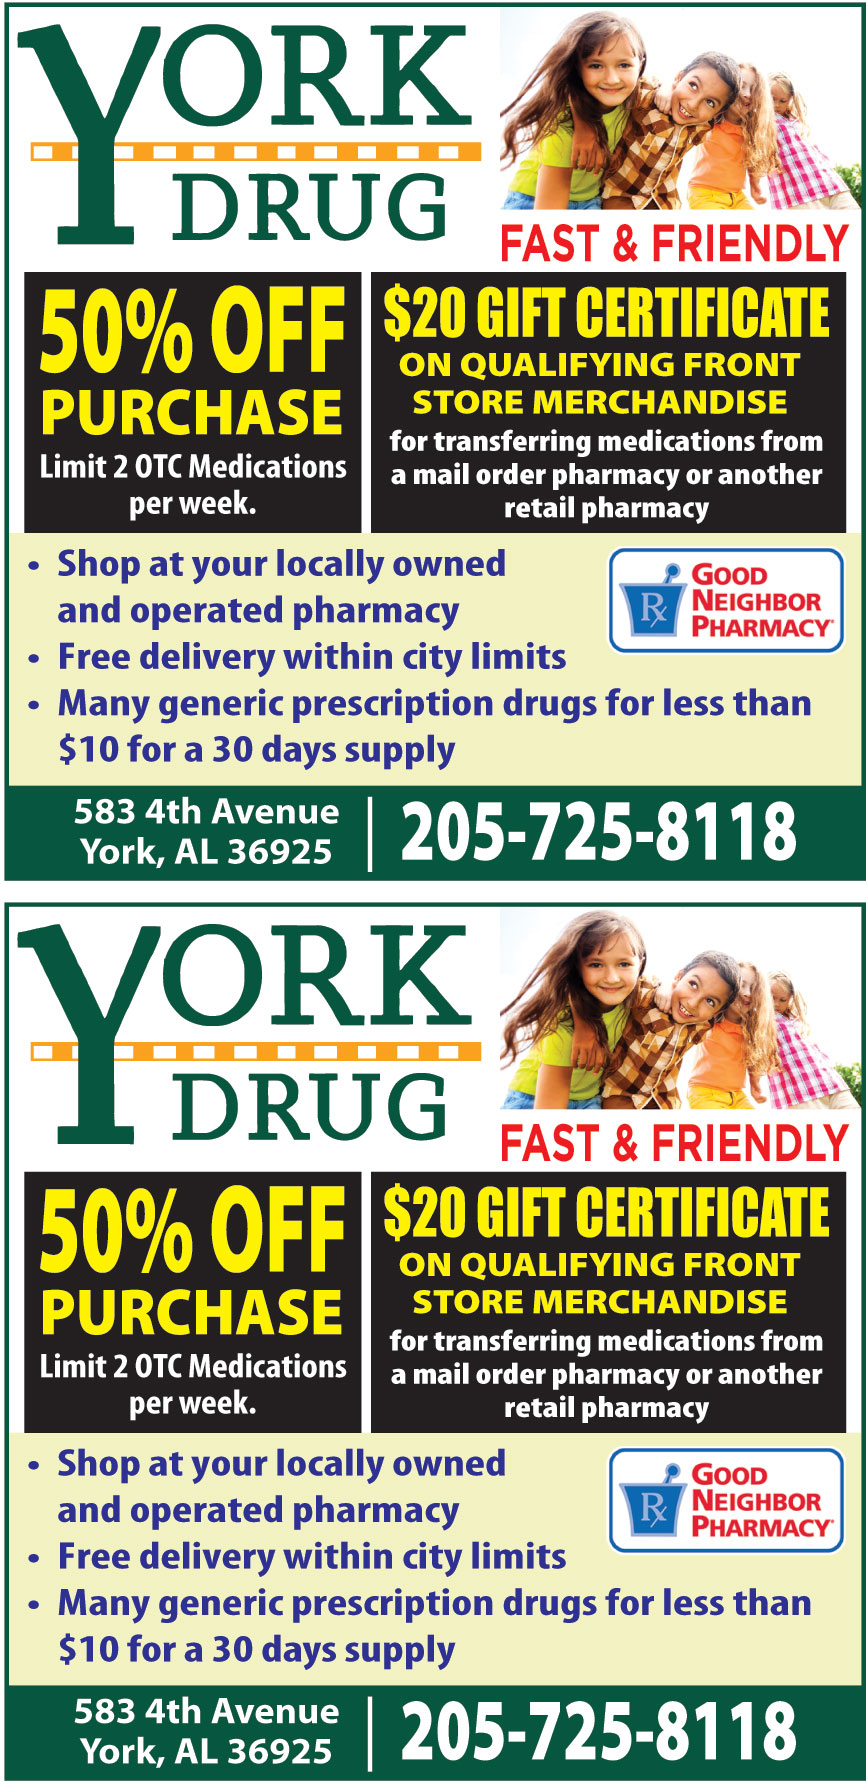 YORK DRUG STORE